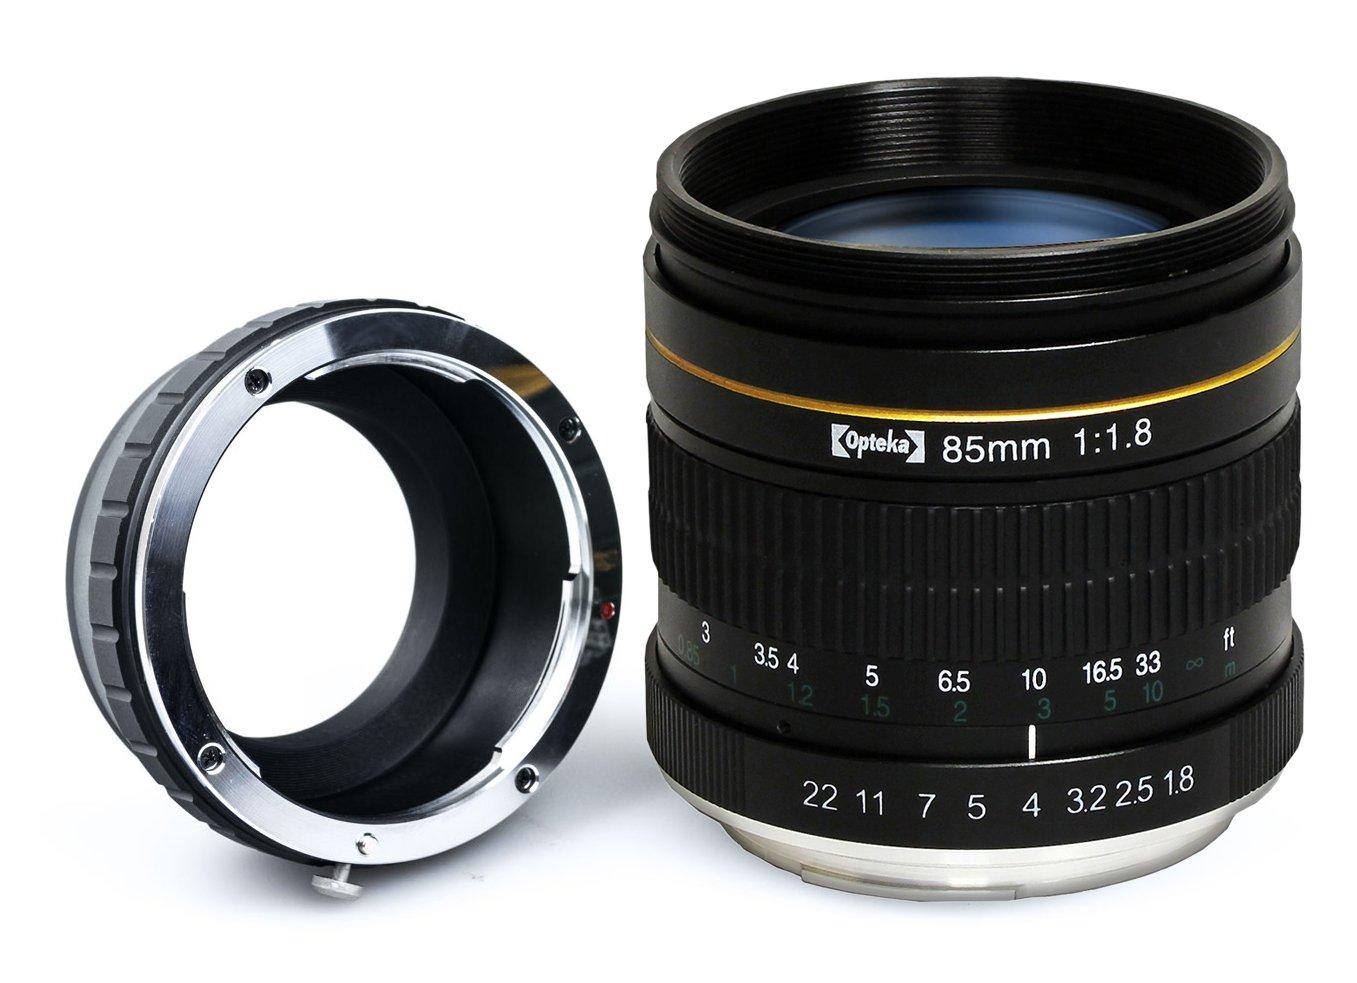 Opteka 85mm f/1.8 Manual Focus Aspherical Medium Telephoto Lens for Canon EOS 80D, 70D, 60D, 60Da, 50D, 7D, 6D, 5D, 5DS, 1Ds, Rebel T6s, T6i, T6, T5i, T5, T4i, T3i, T3, T2i and SL1 Digital SLR Cameras OPT8518C